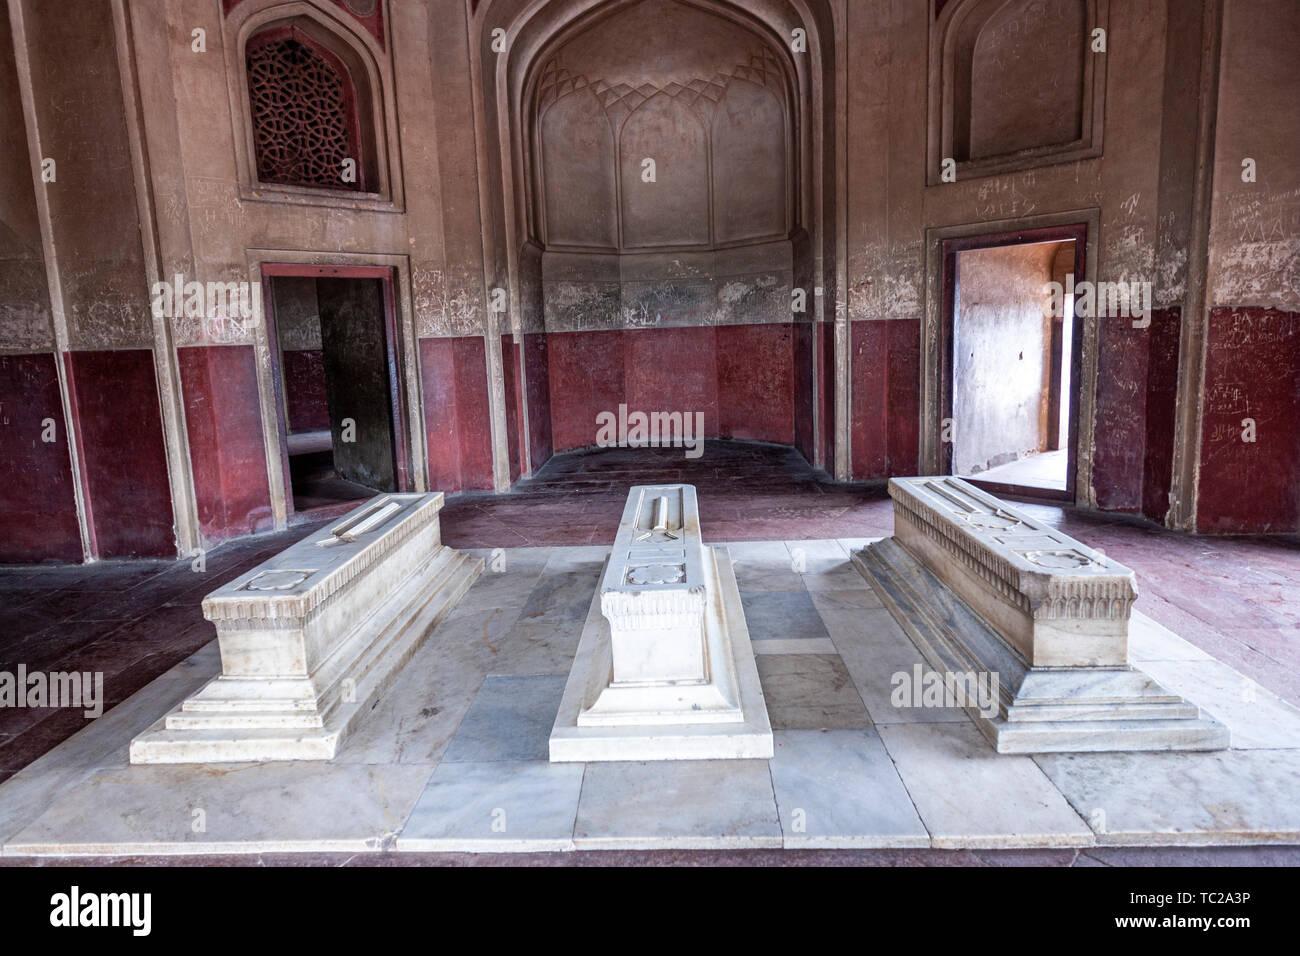 Cenotaphs of Hamida Banu Begum, Dara Shikoh, Humayun's Tomb, Delhi, India - Stock Image